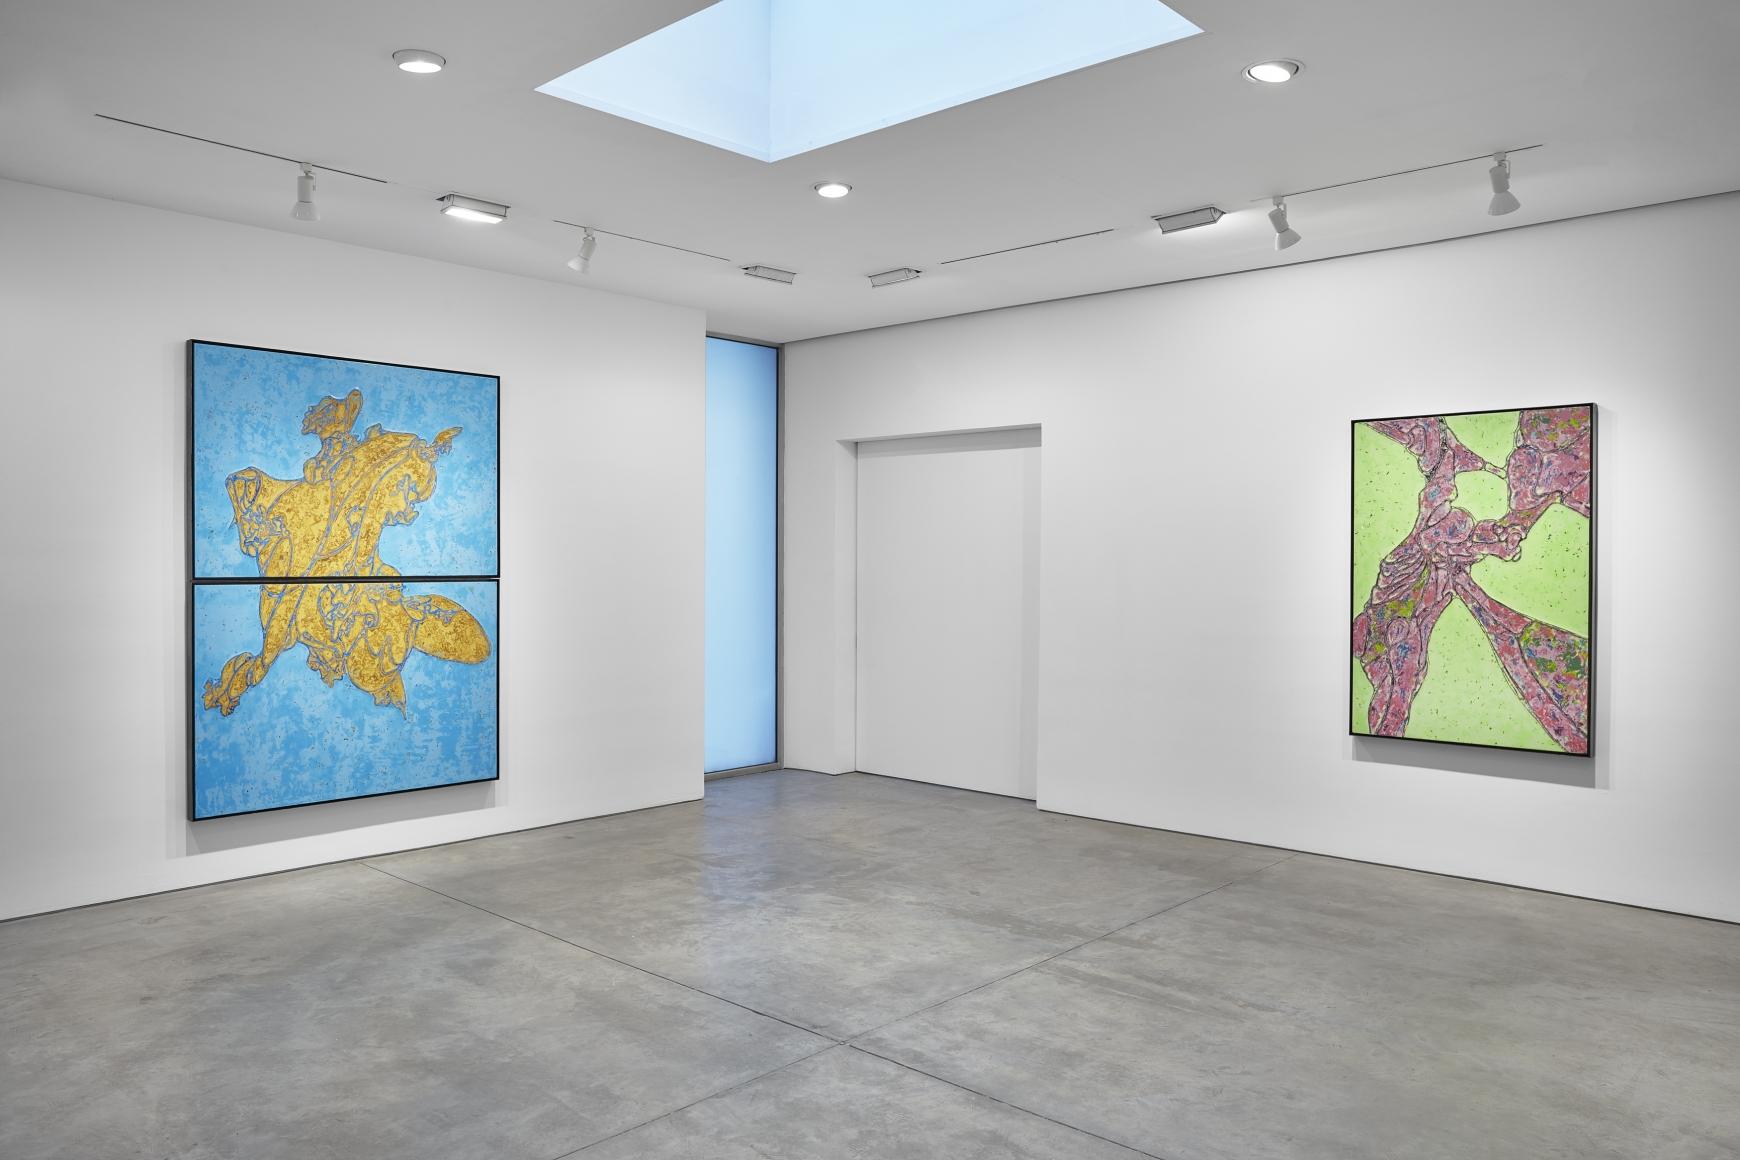 Lee Bul, Interlude: Perdu Installation view 4